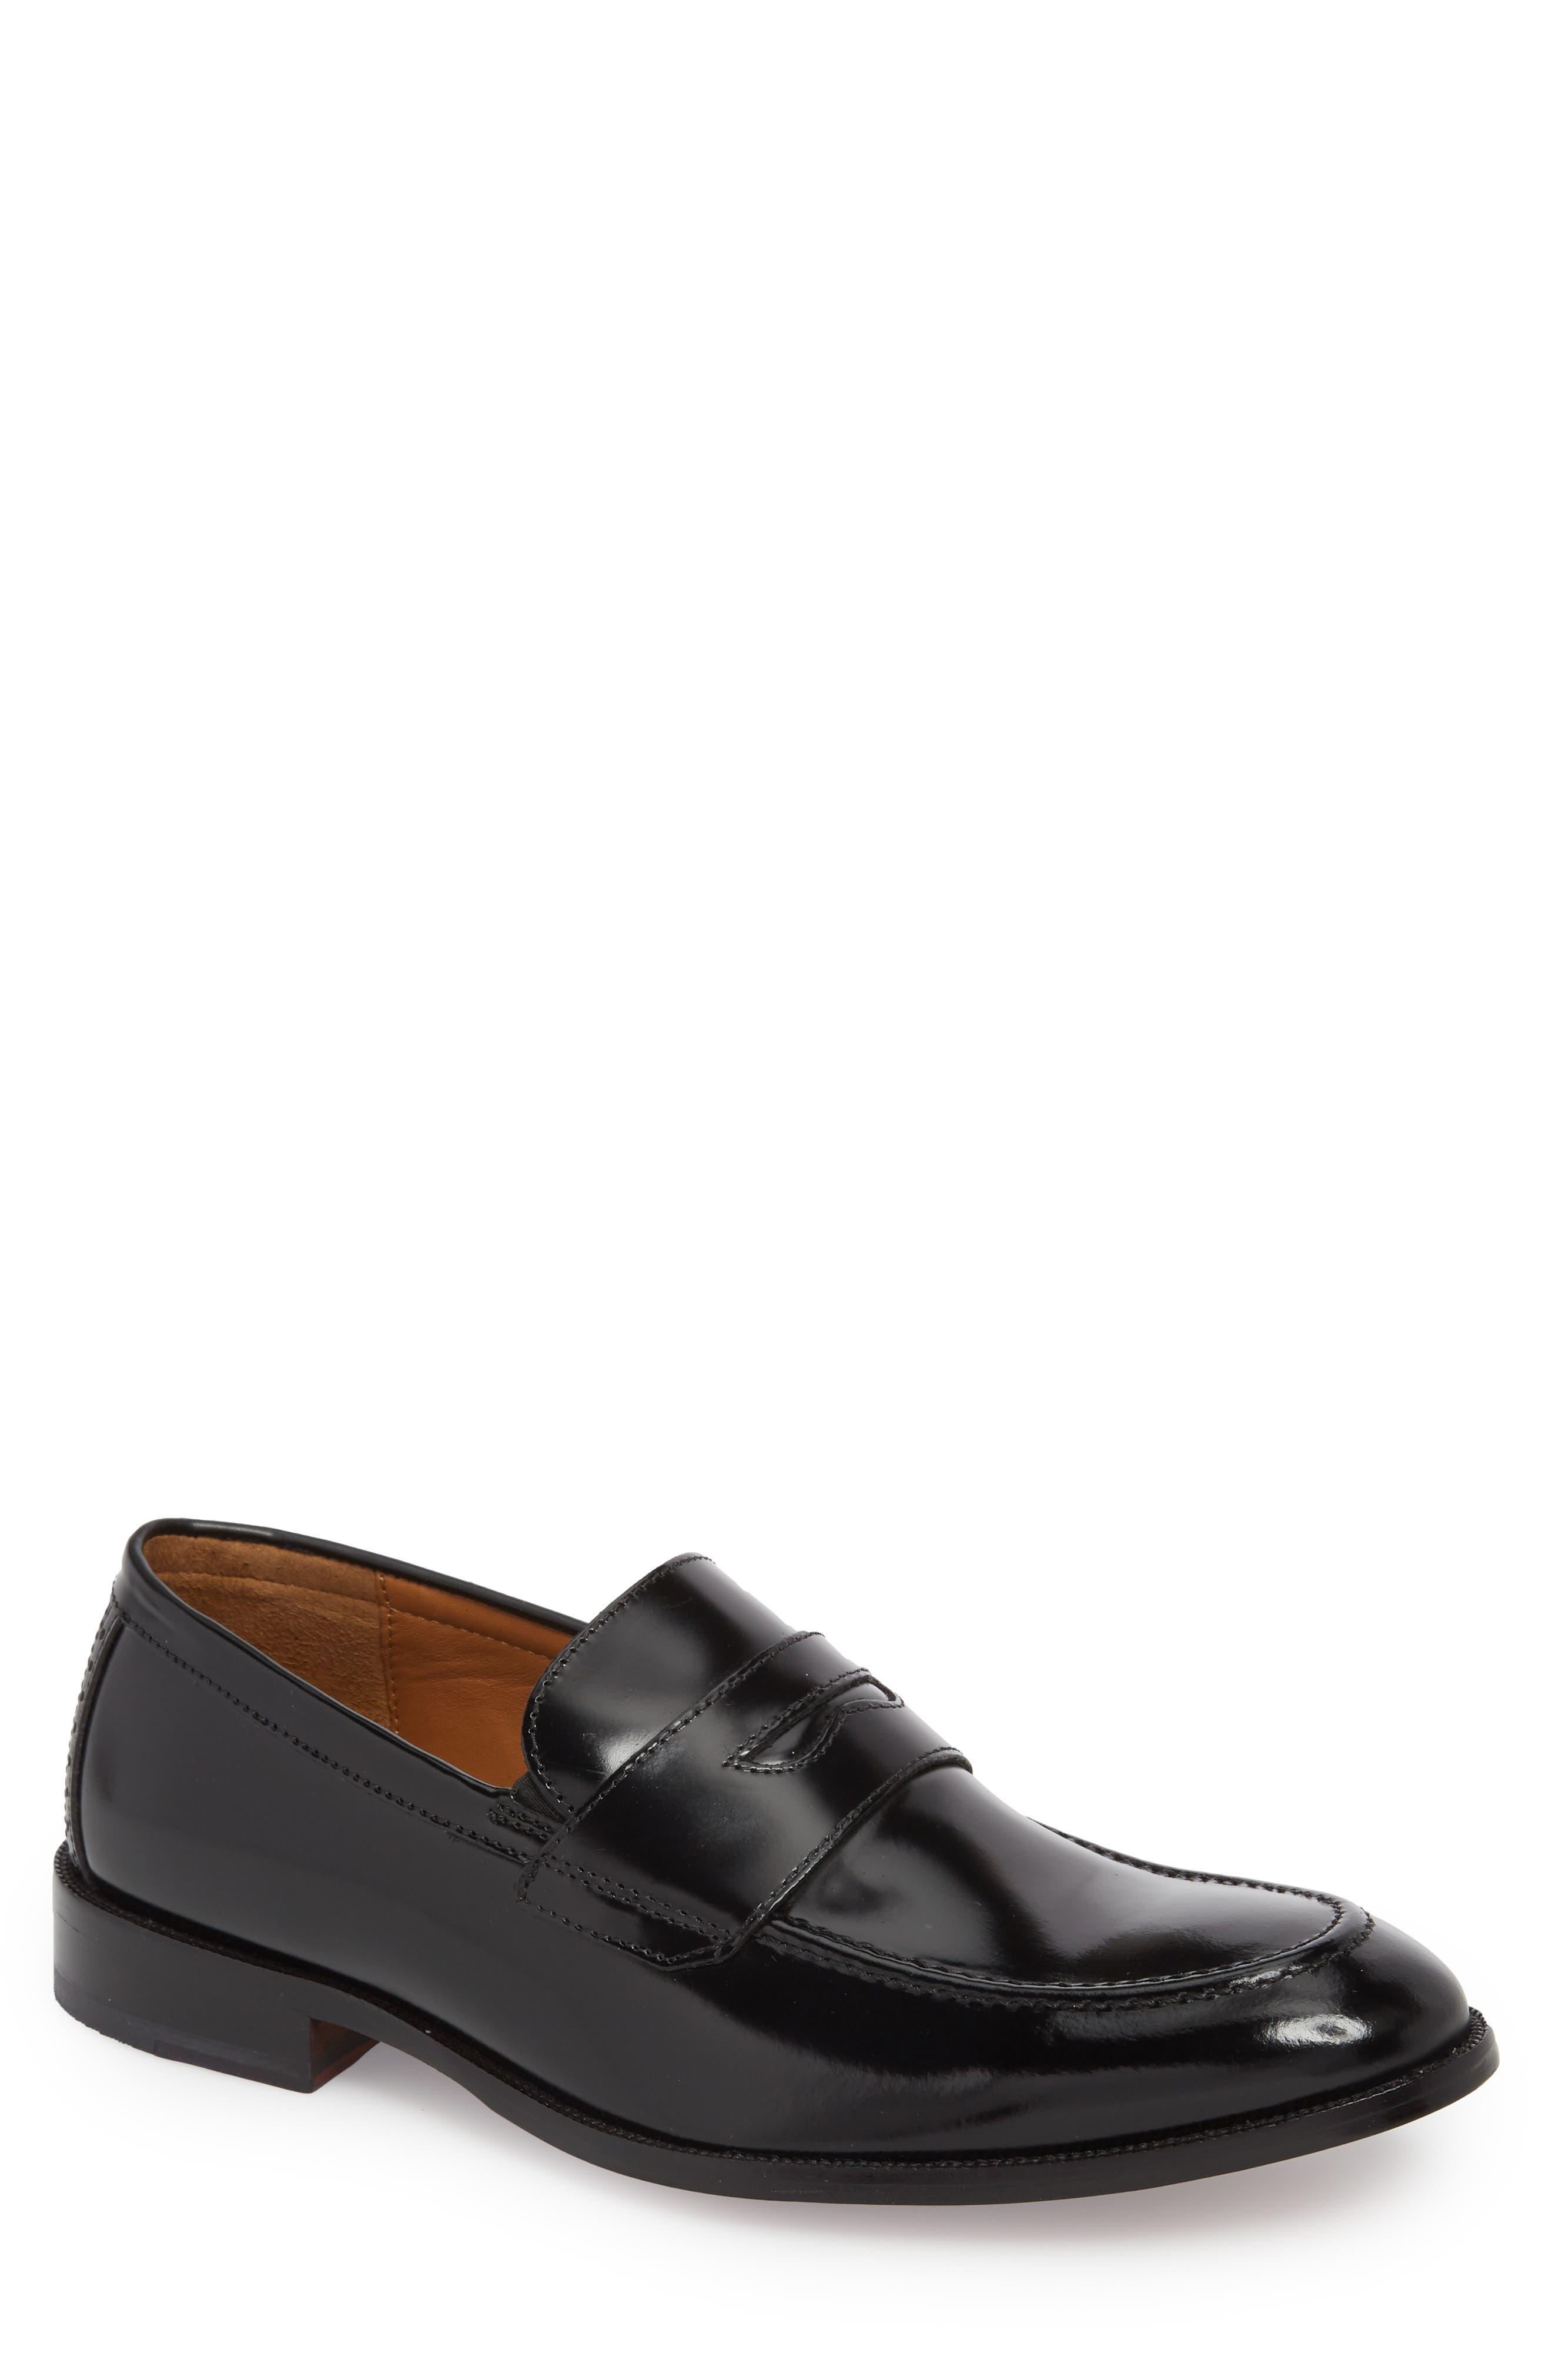 Bradford Penny Loafer,                         Main,                         color, Black Leather